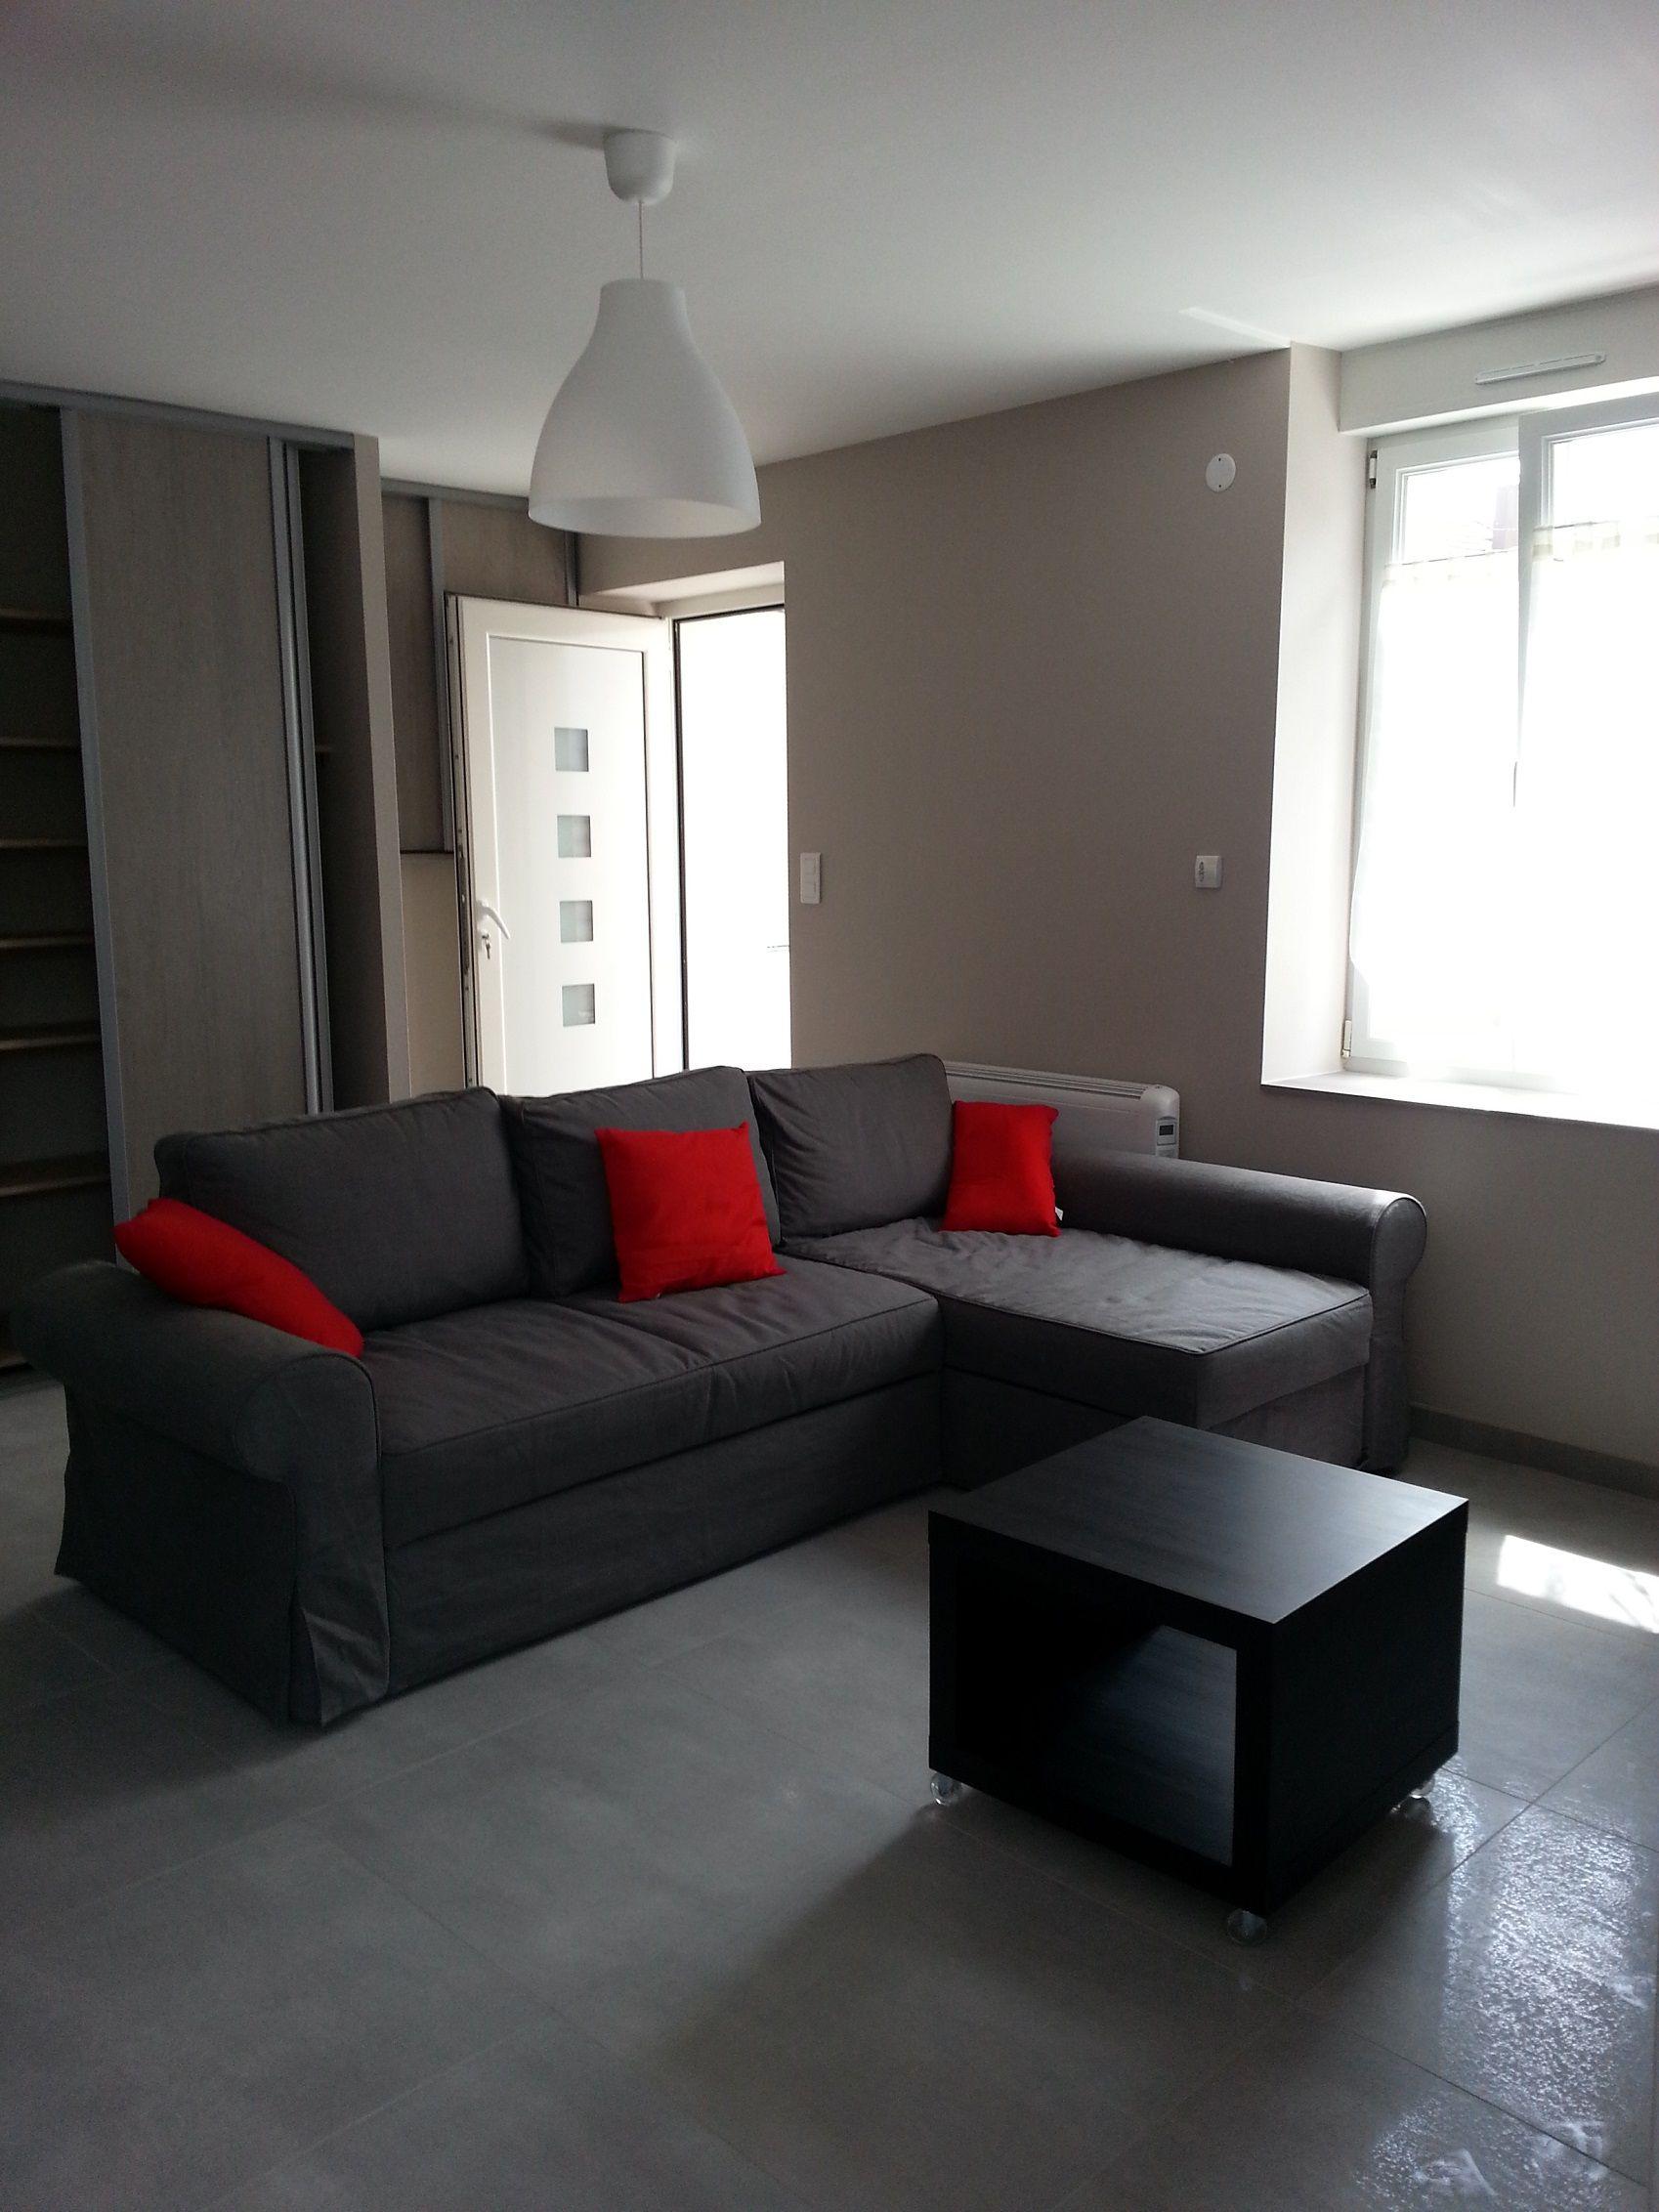 Meuble forelle sylvie appartement n 10 lorraine tourisme for Meuble appartement